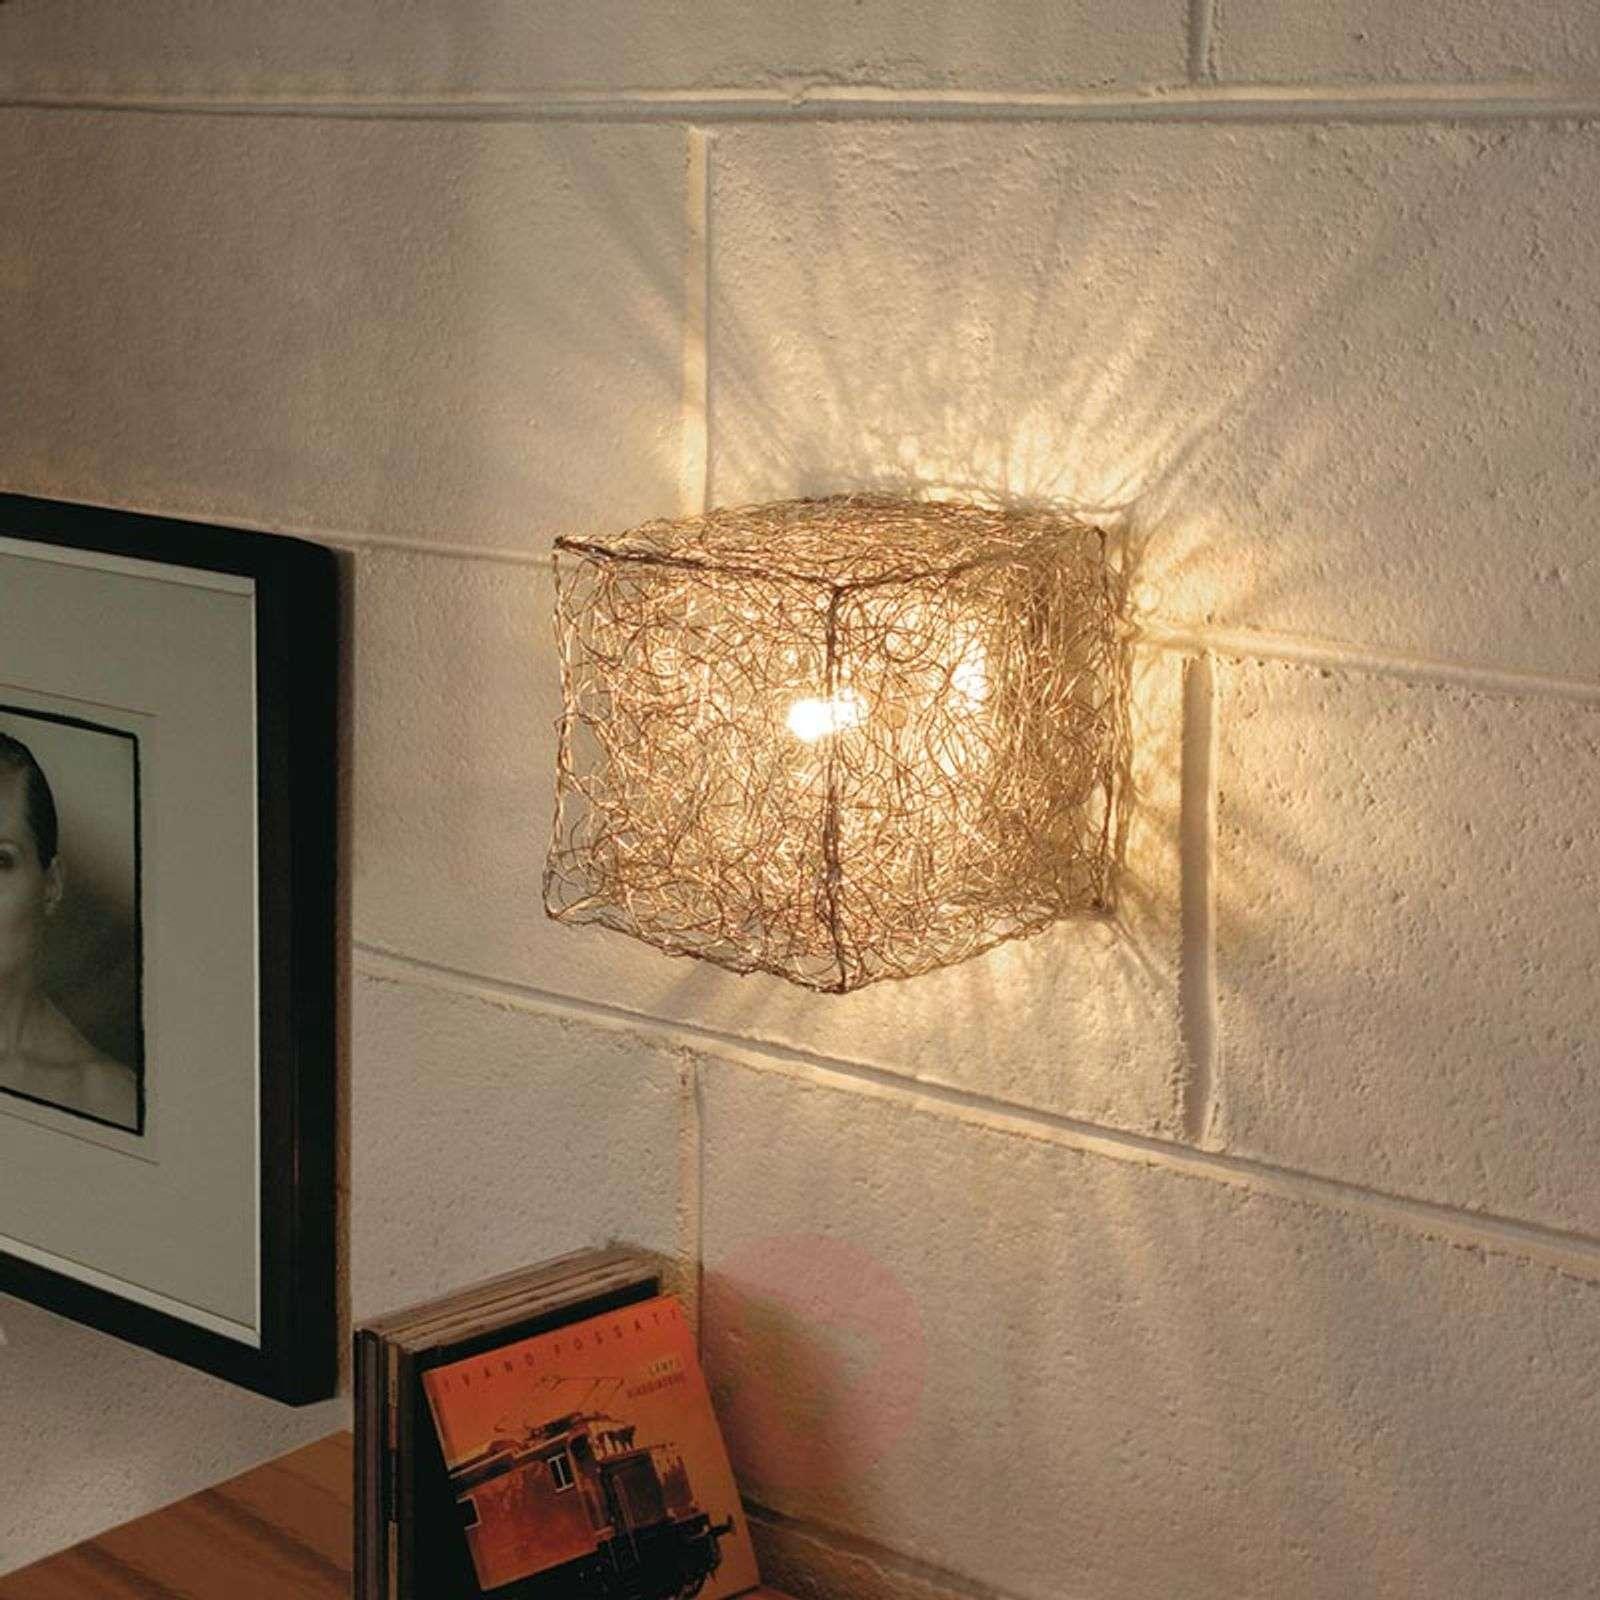 Knikerboker Qubetto cube-shaped wall lamp-5538042-01